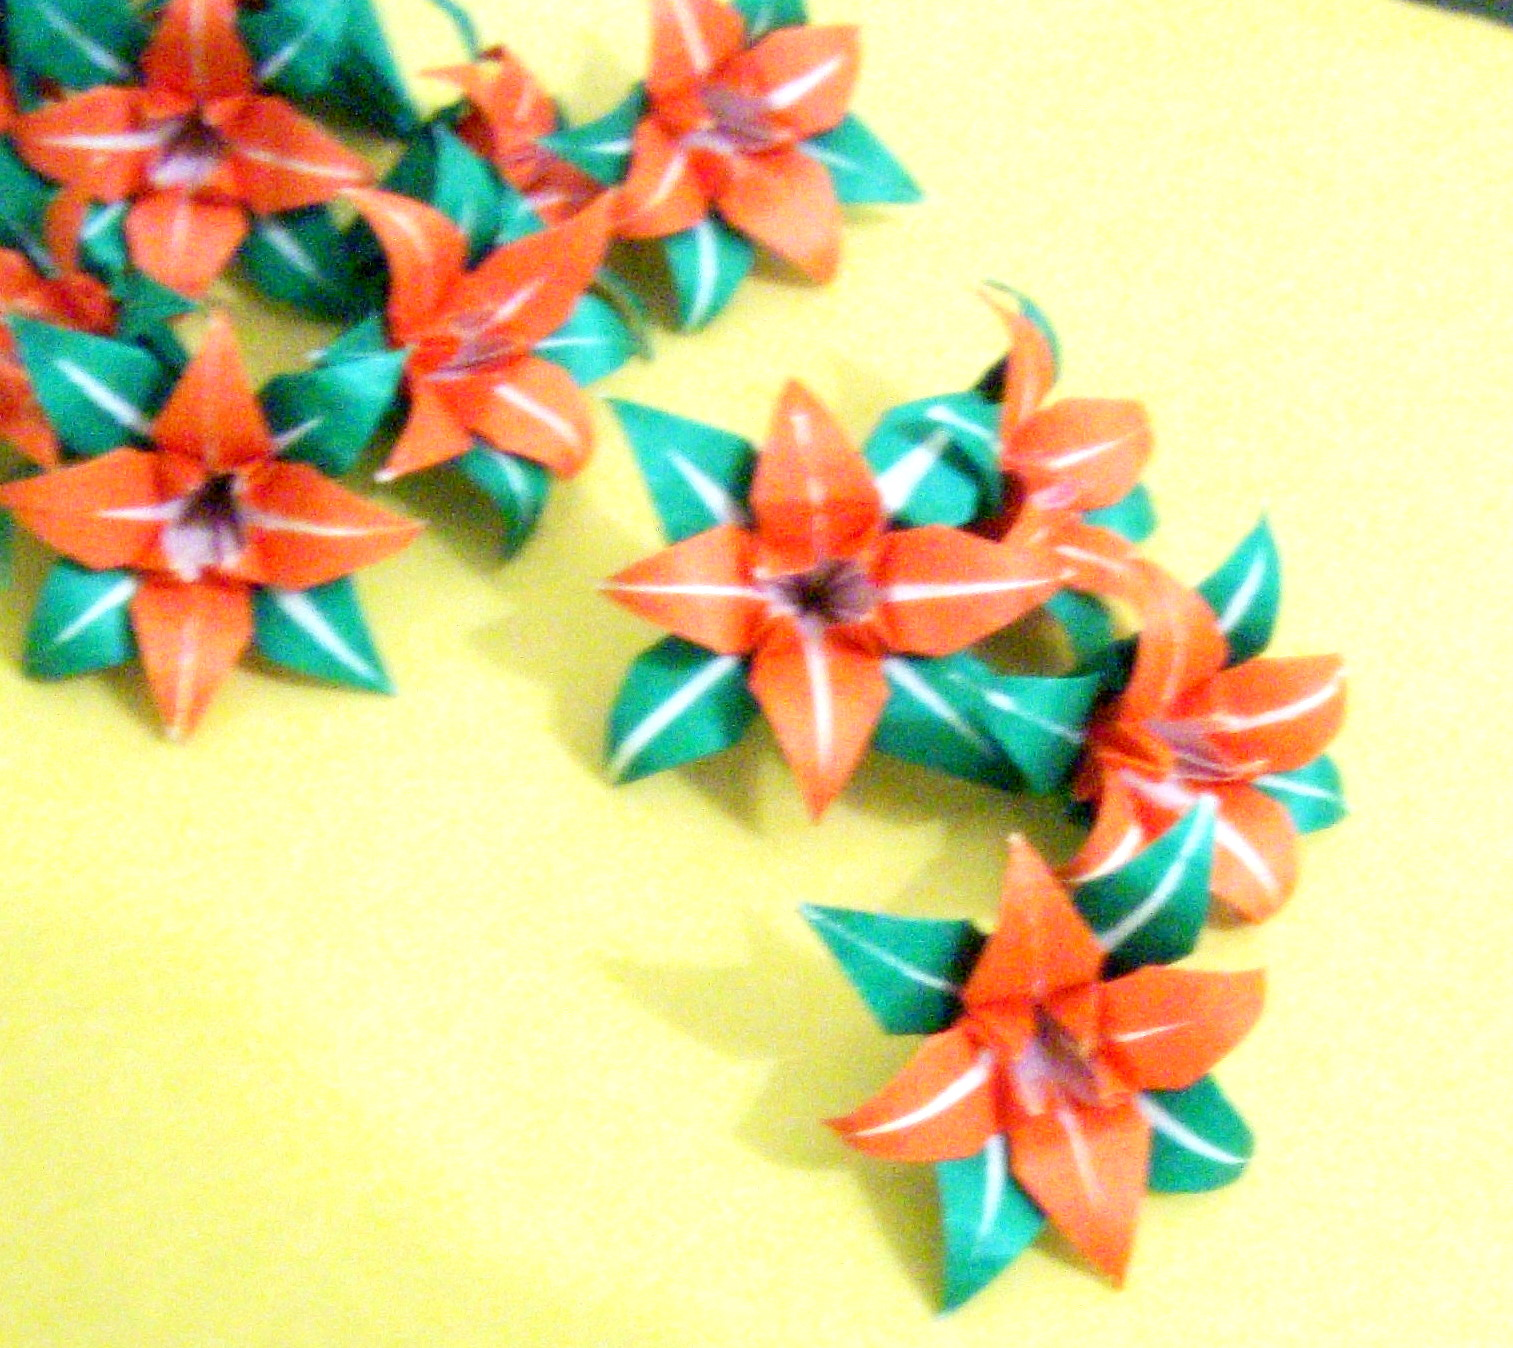 Origami February 2011